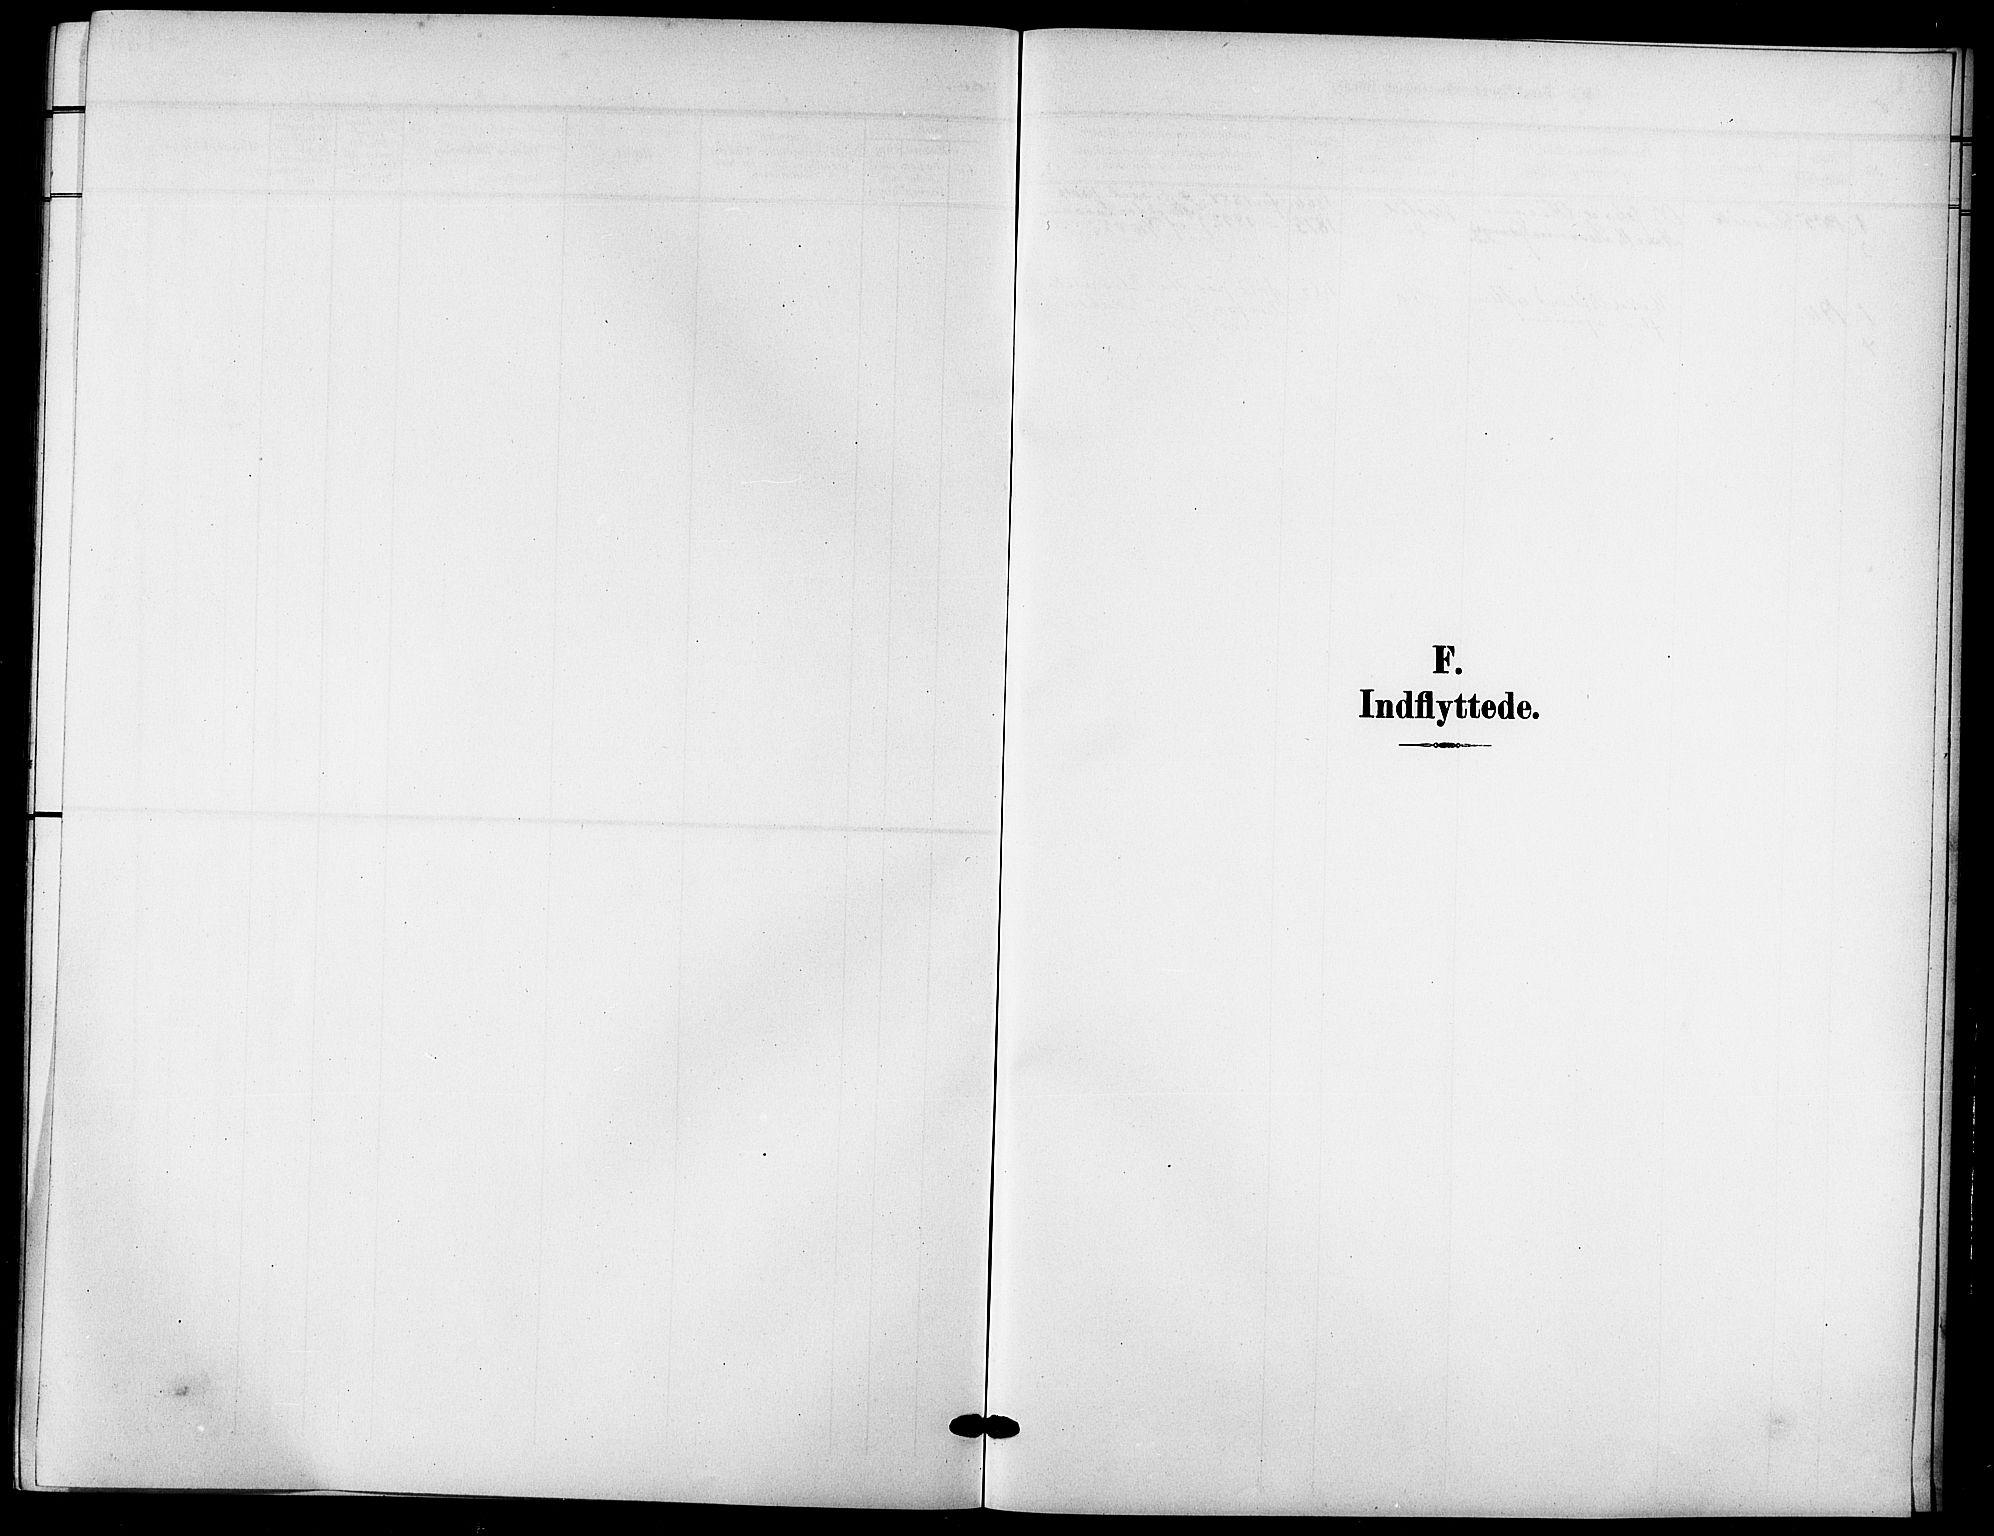 SATØ, Tranøy sokneprestkontor, I/Ia/Iab/L0005klokker: Klokkerbok nr. 5, 1902-1919